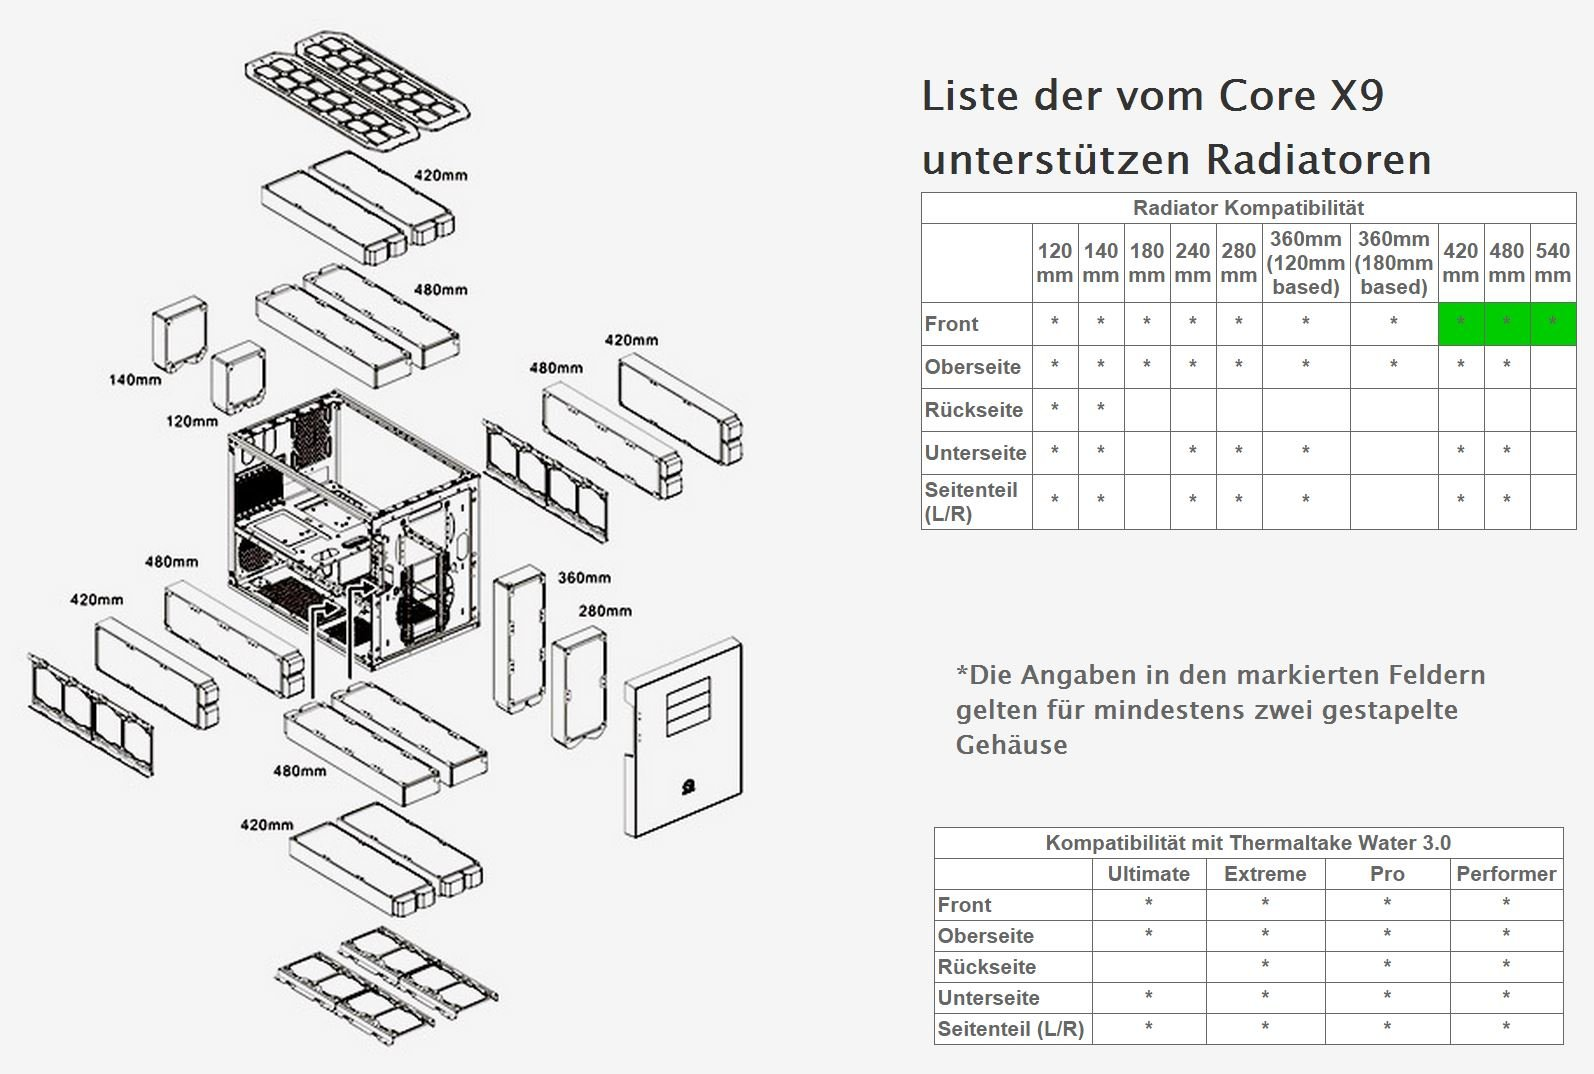 Thermaltake Core X9